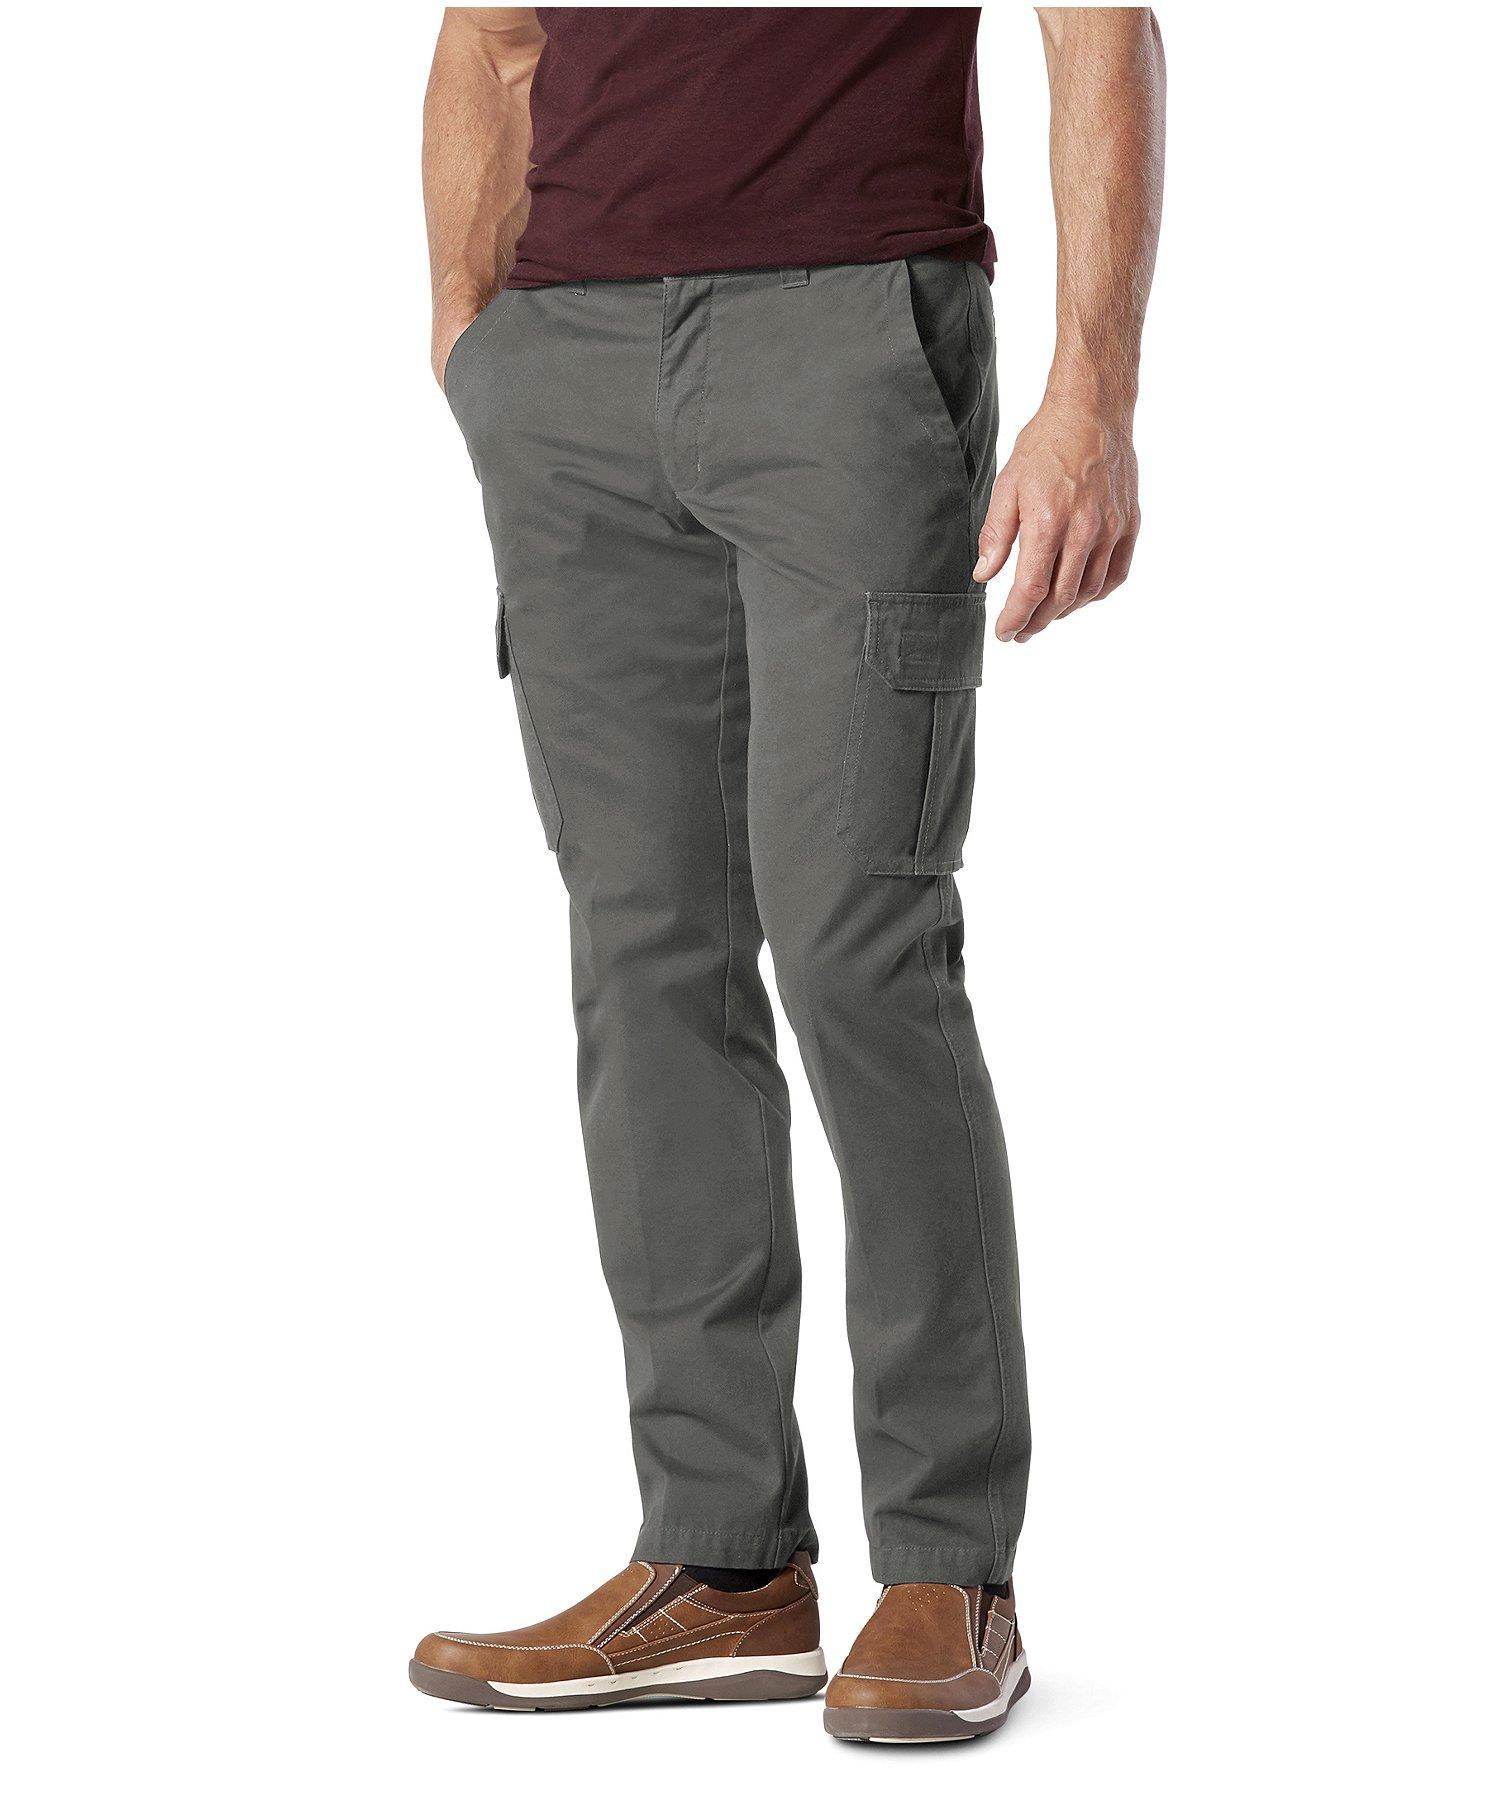 f6125e7b Men's Cotton Twill Cargo Pants